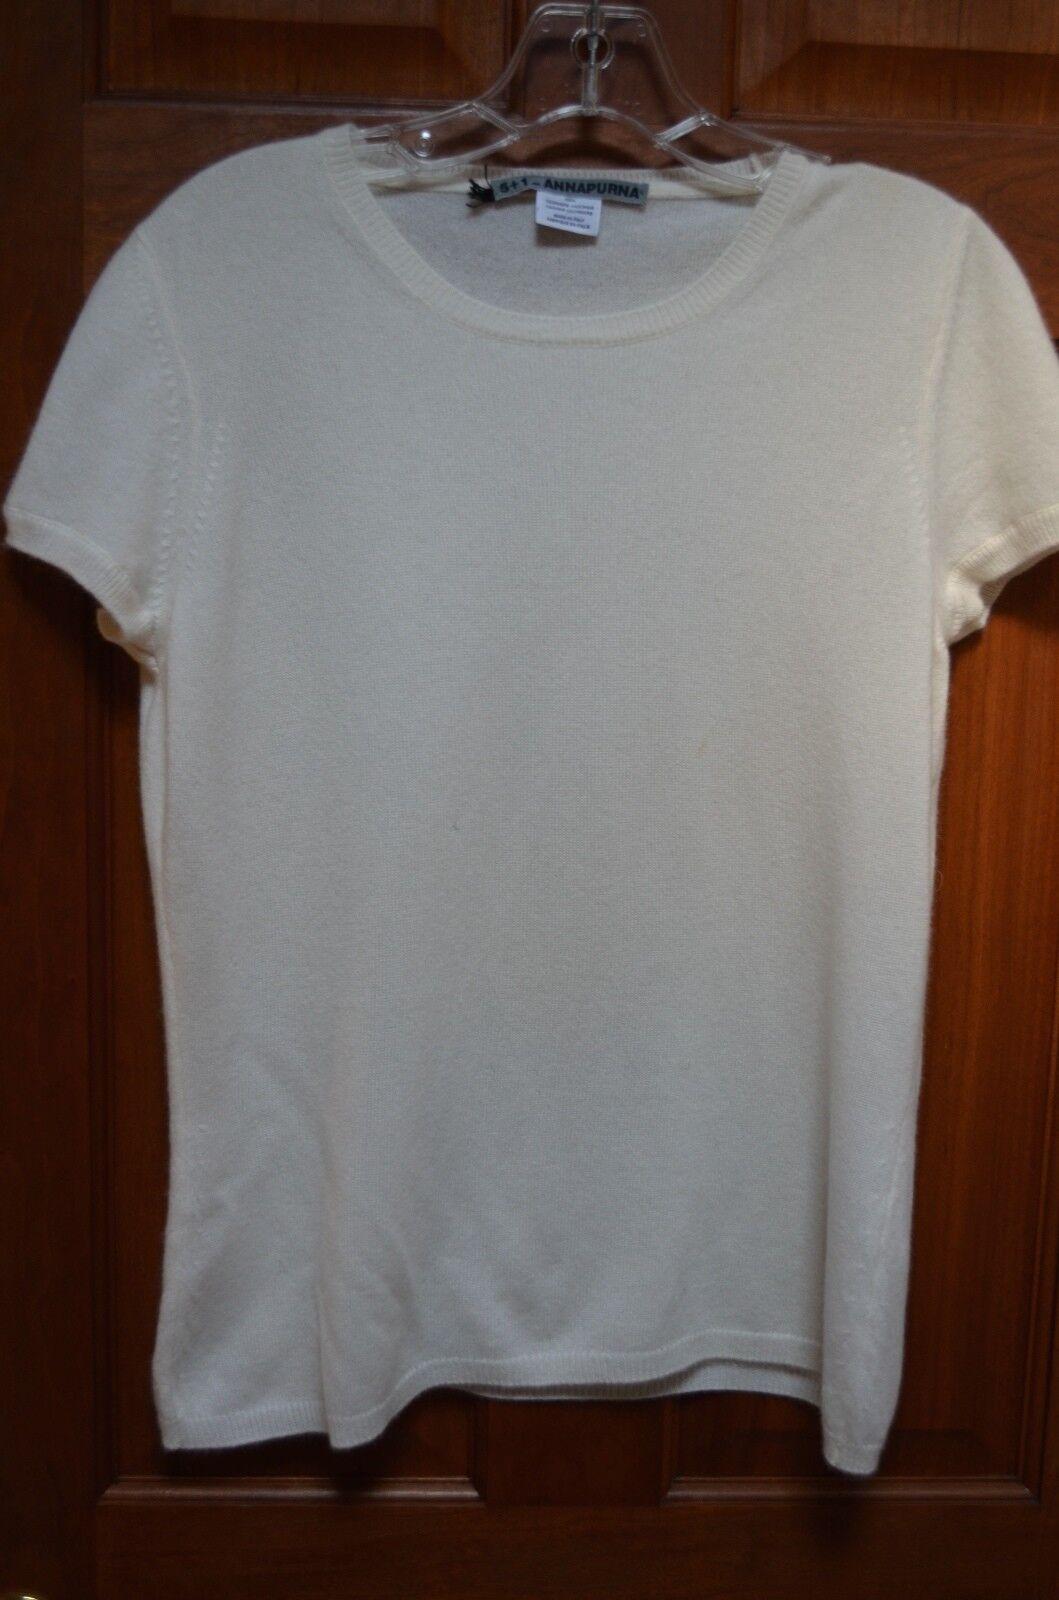 Annapurna 5+1 Women's Ivory 100% Cashmere Short Sleeve Sweater Size L